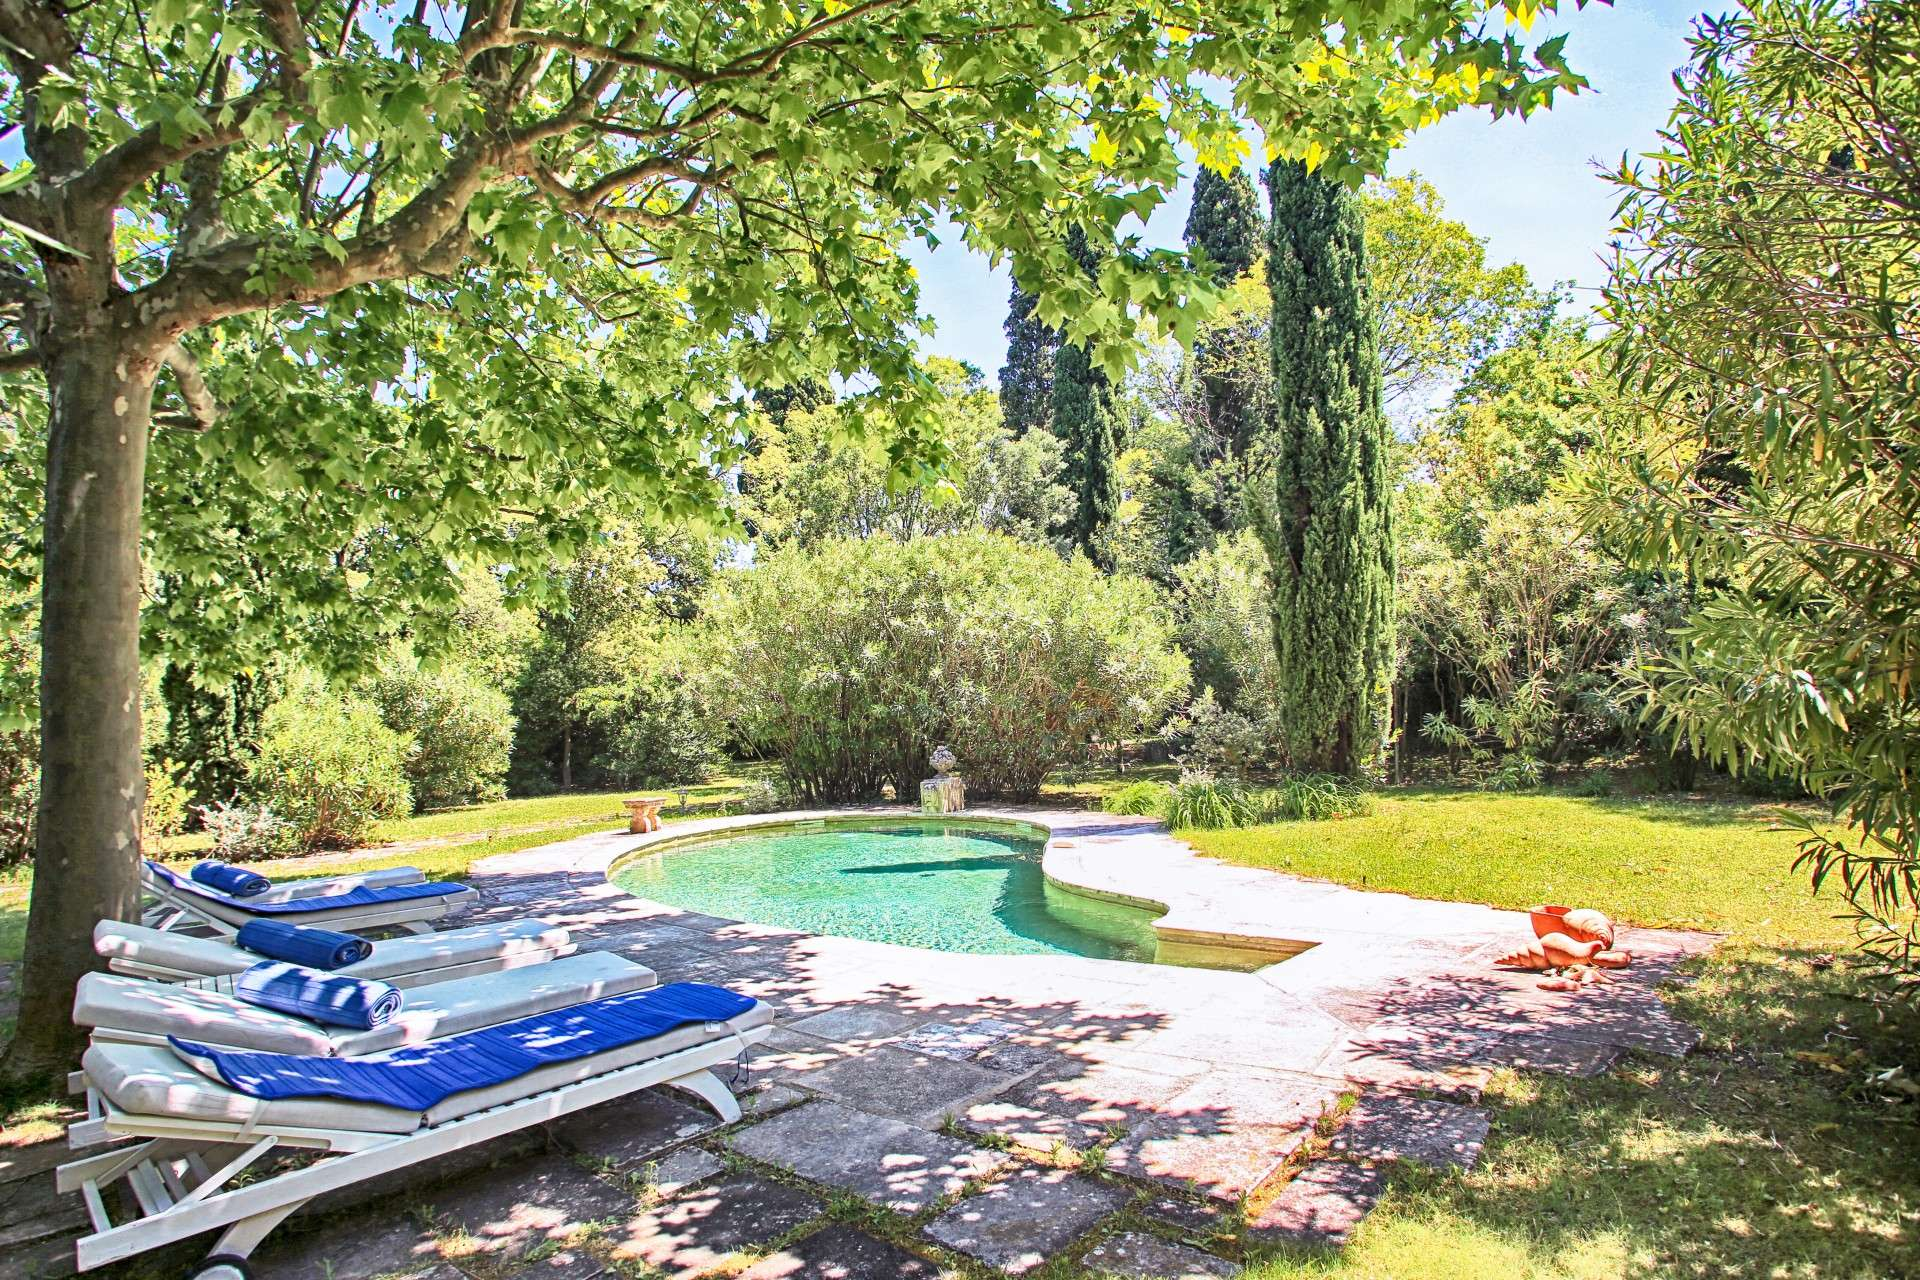 Luxury vacation rentals europe - France - Provence ih - Avi gnon - Boulbon - Image 1/25